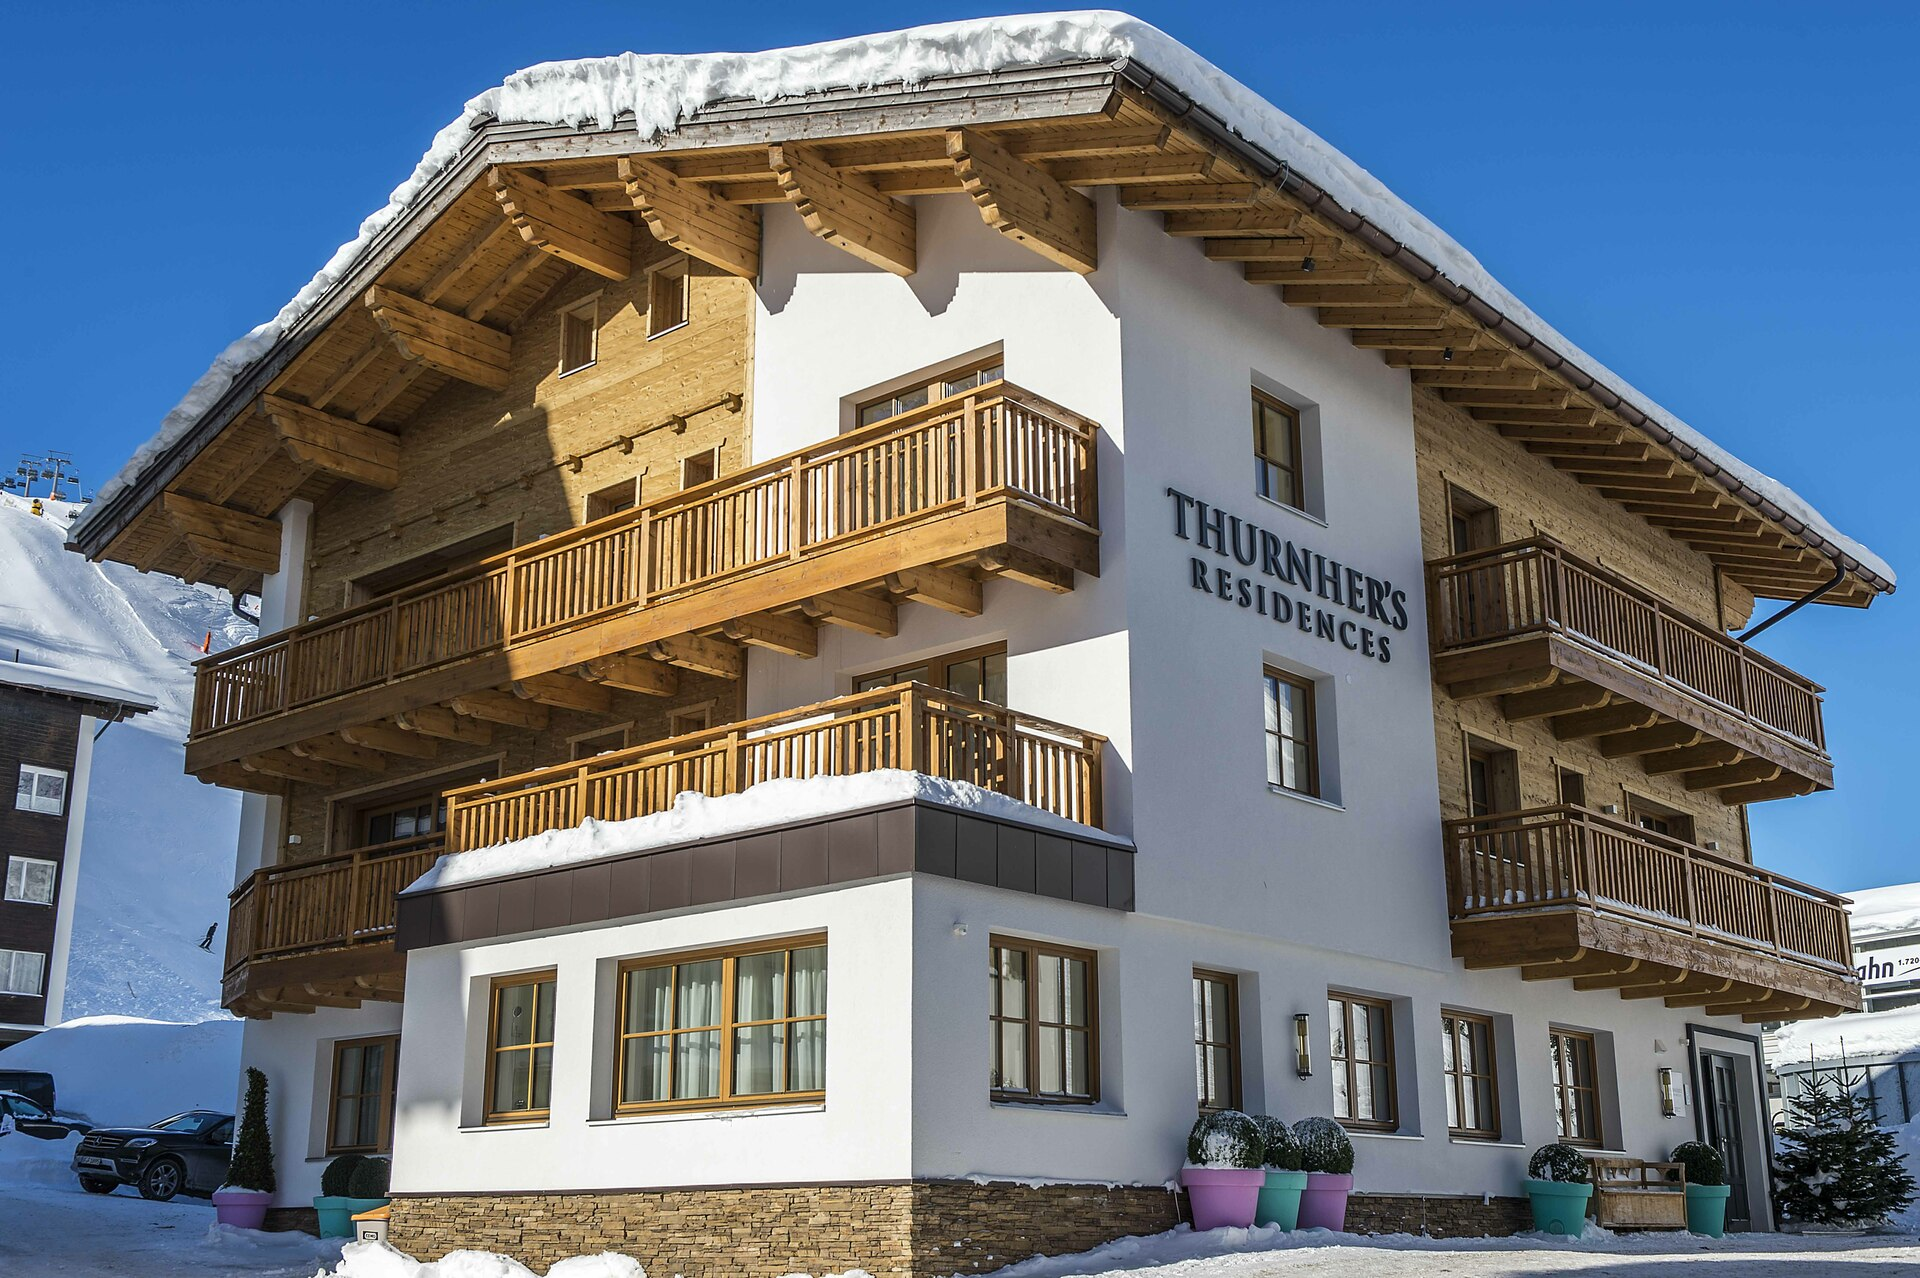 Thurnher's Residences Aussen